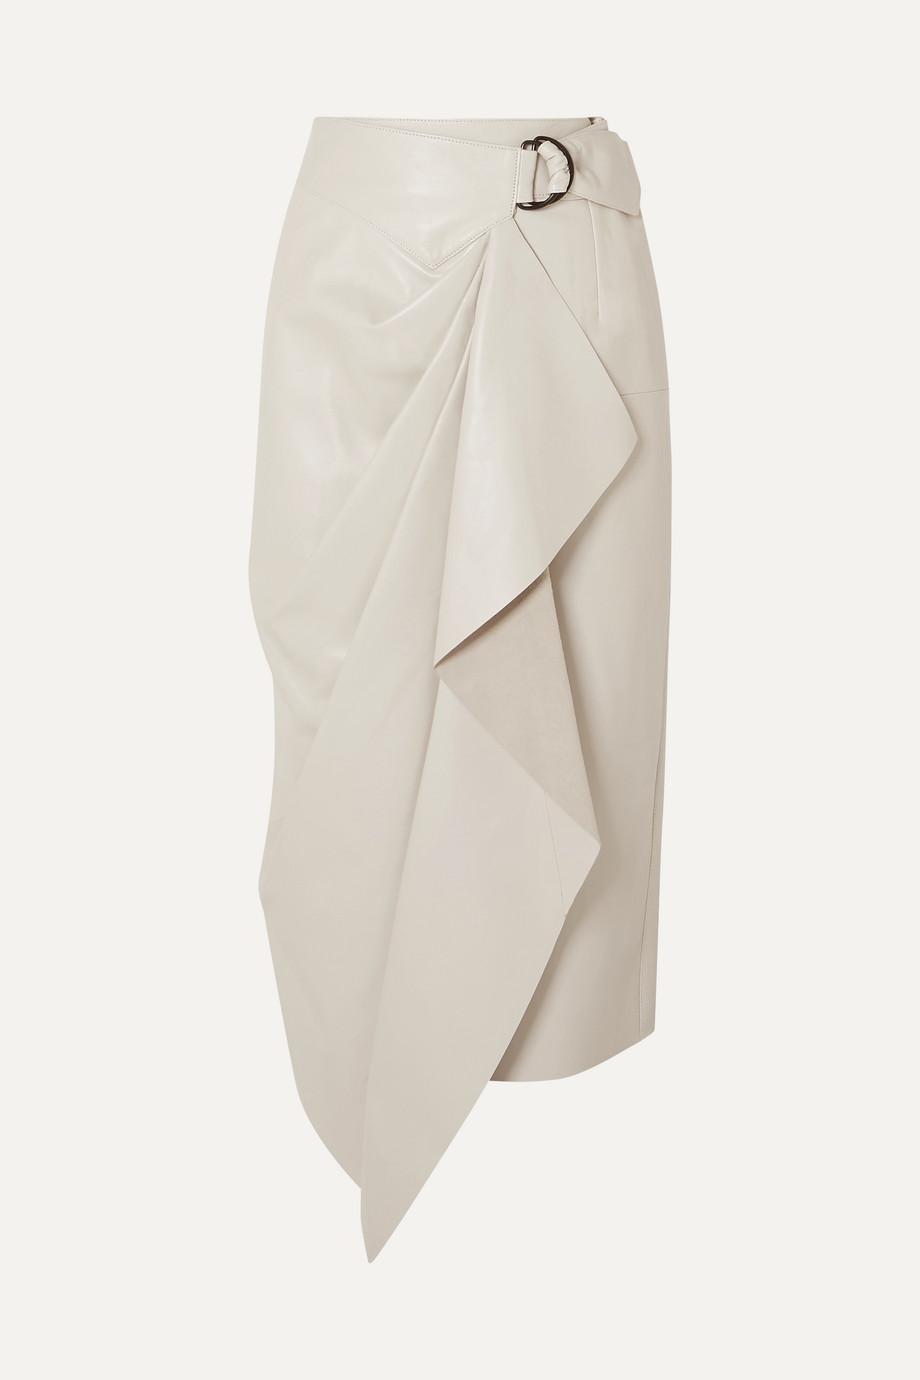 Isabel Marant Fiova 皮革围裹效果中长半身裙